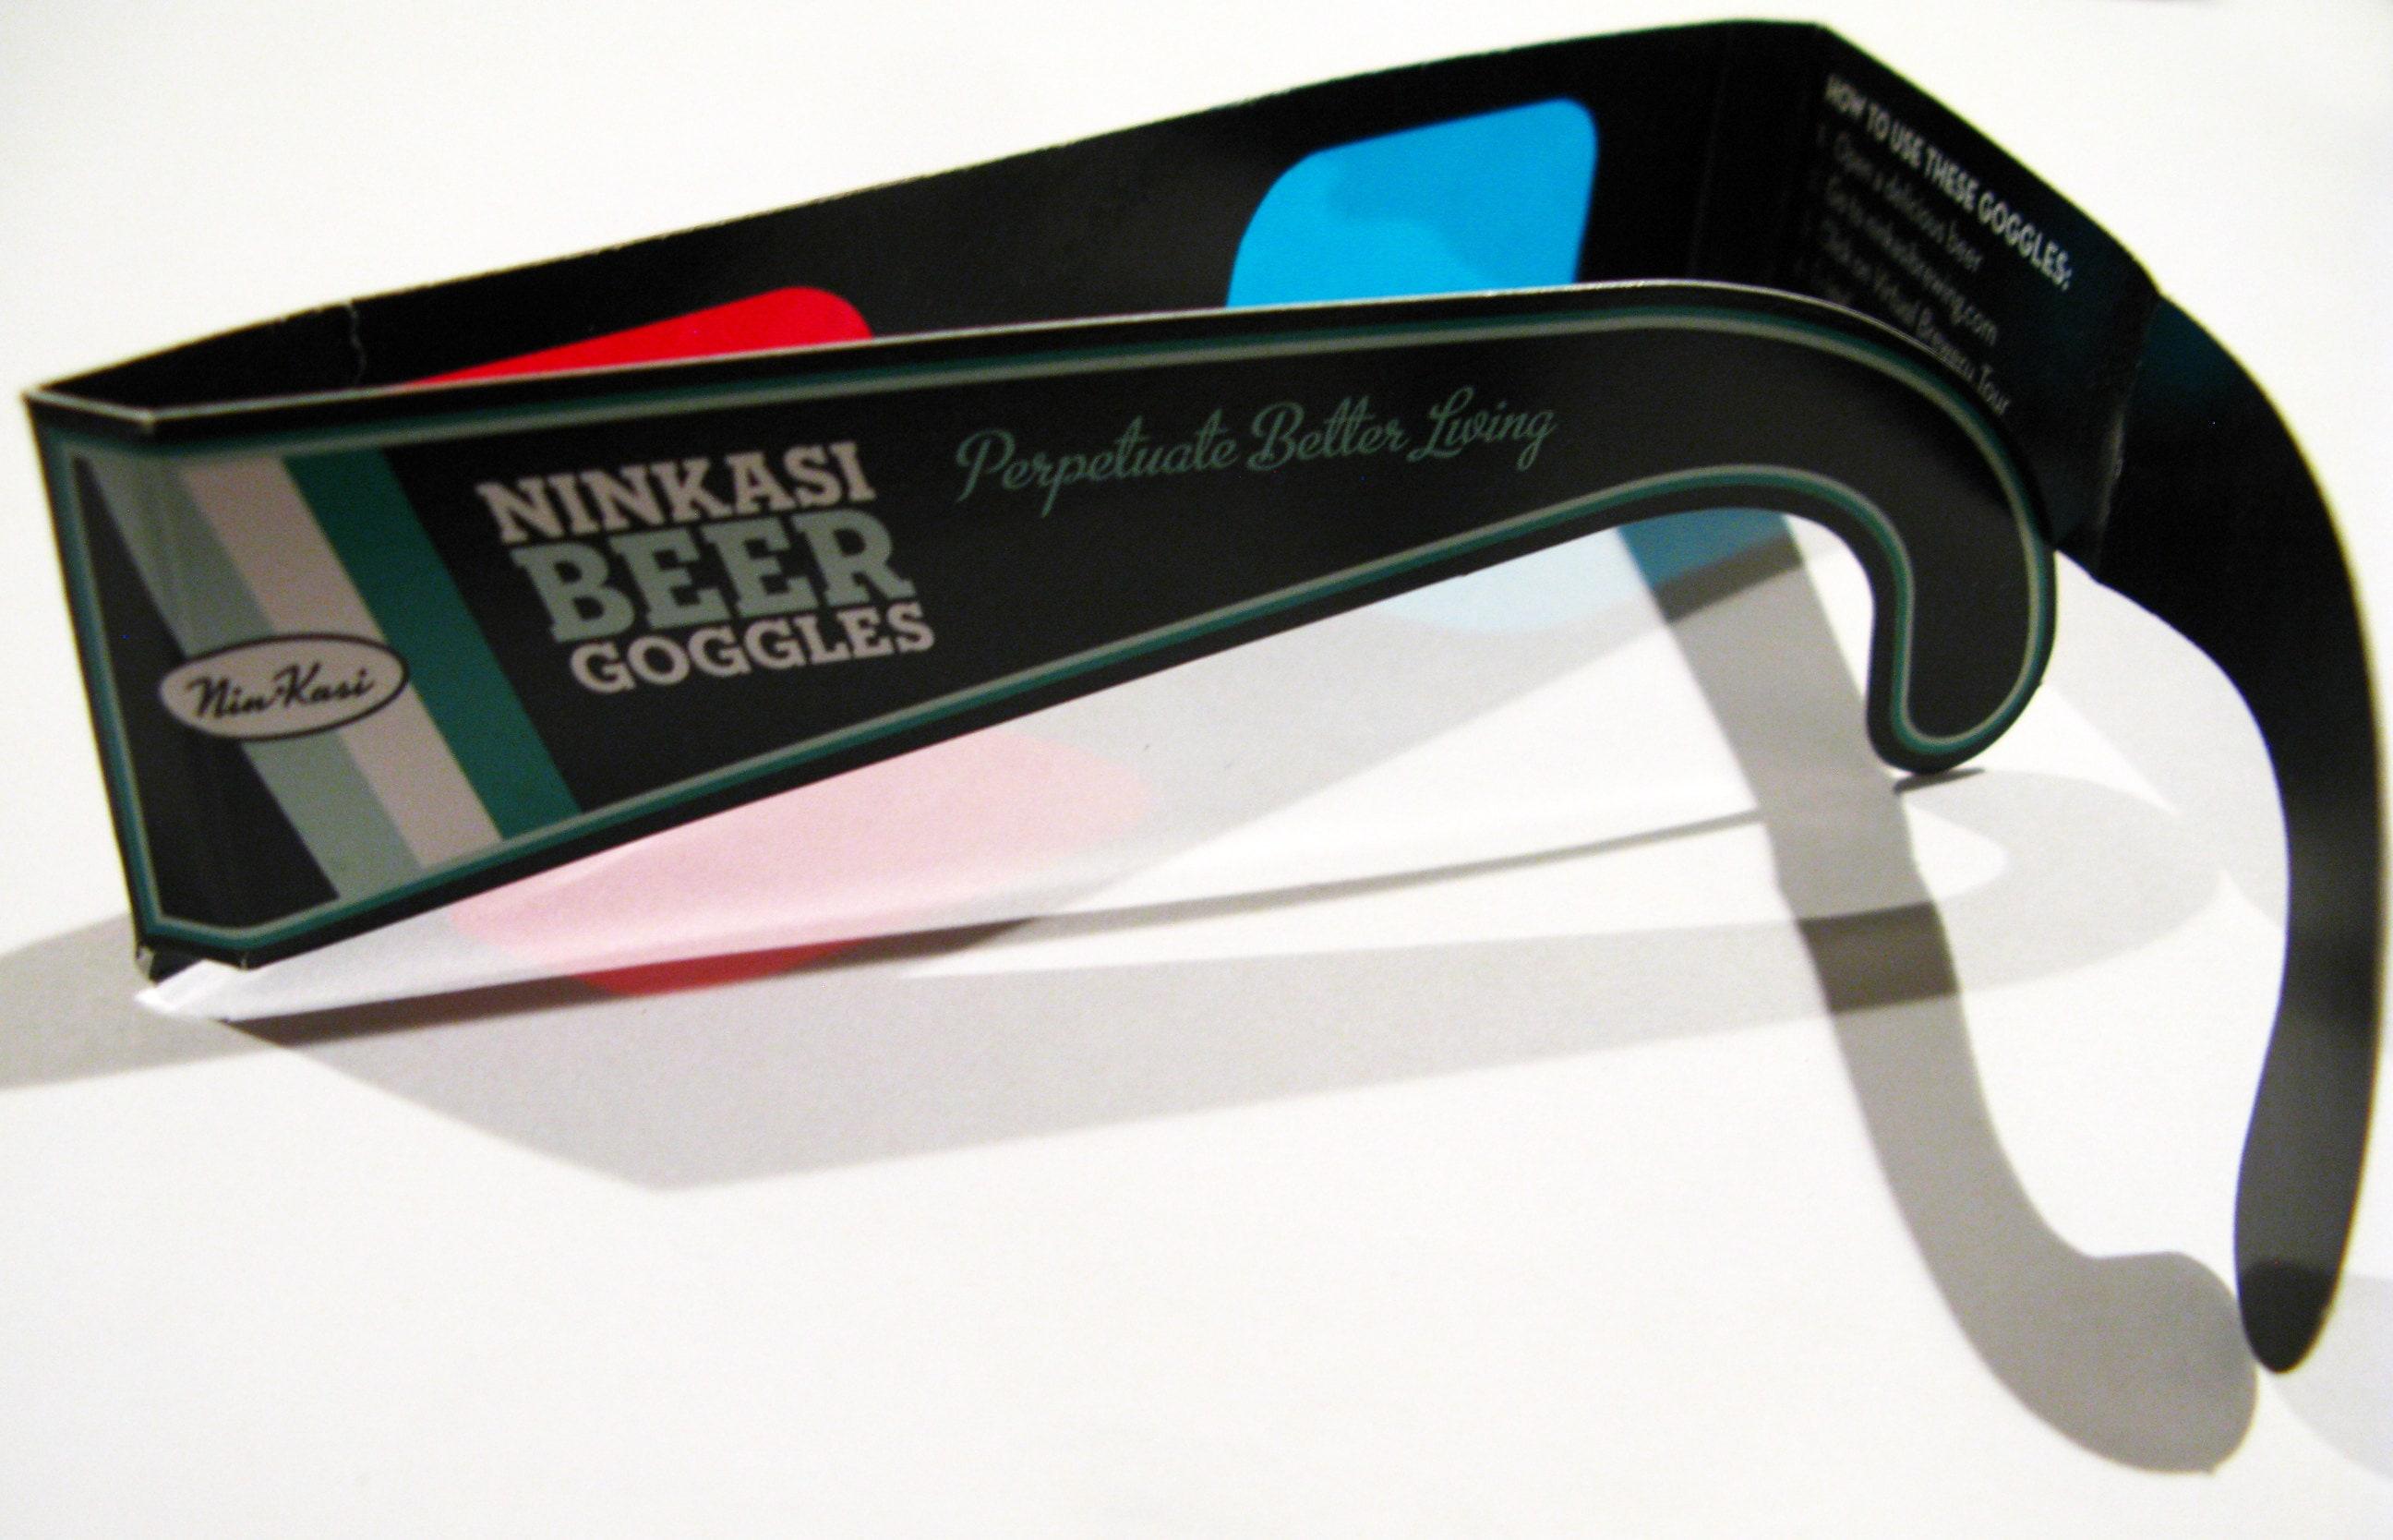 Ninkasi Beer Goggles